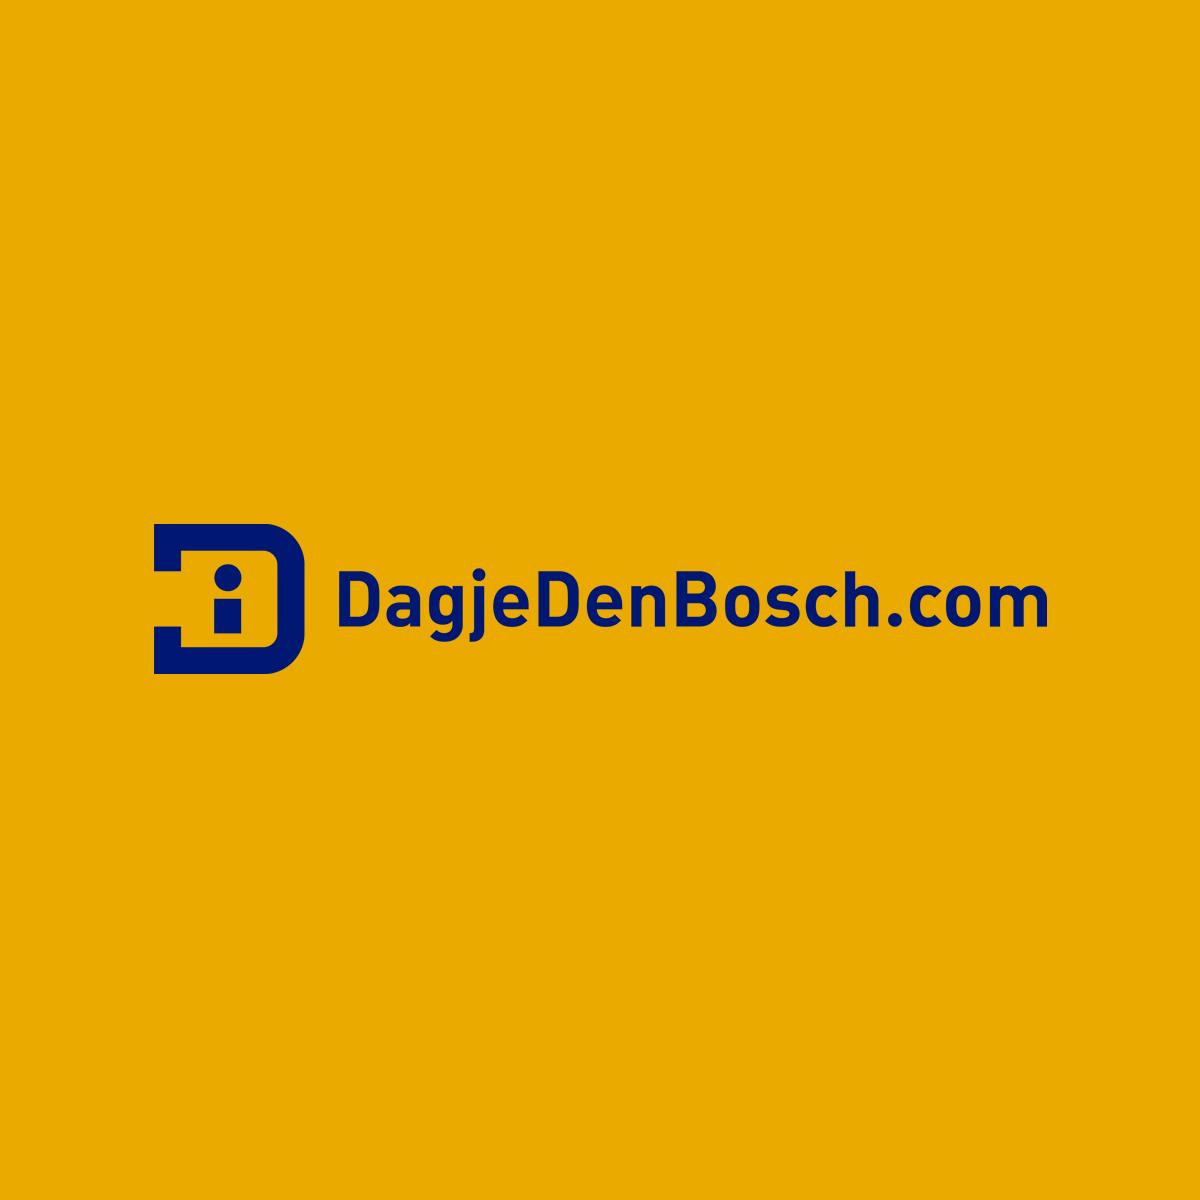 logo dagjedenbosch.com